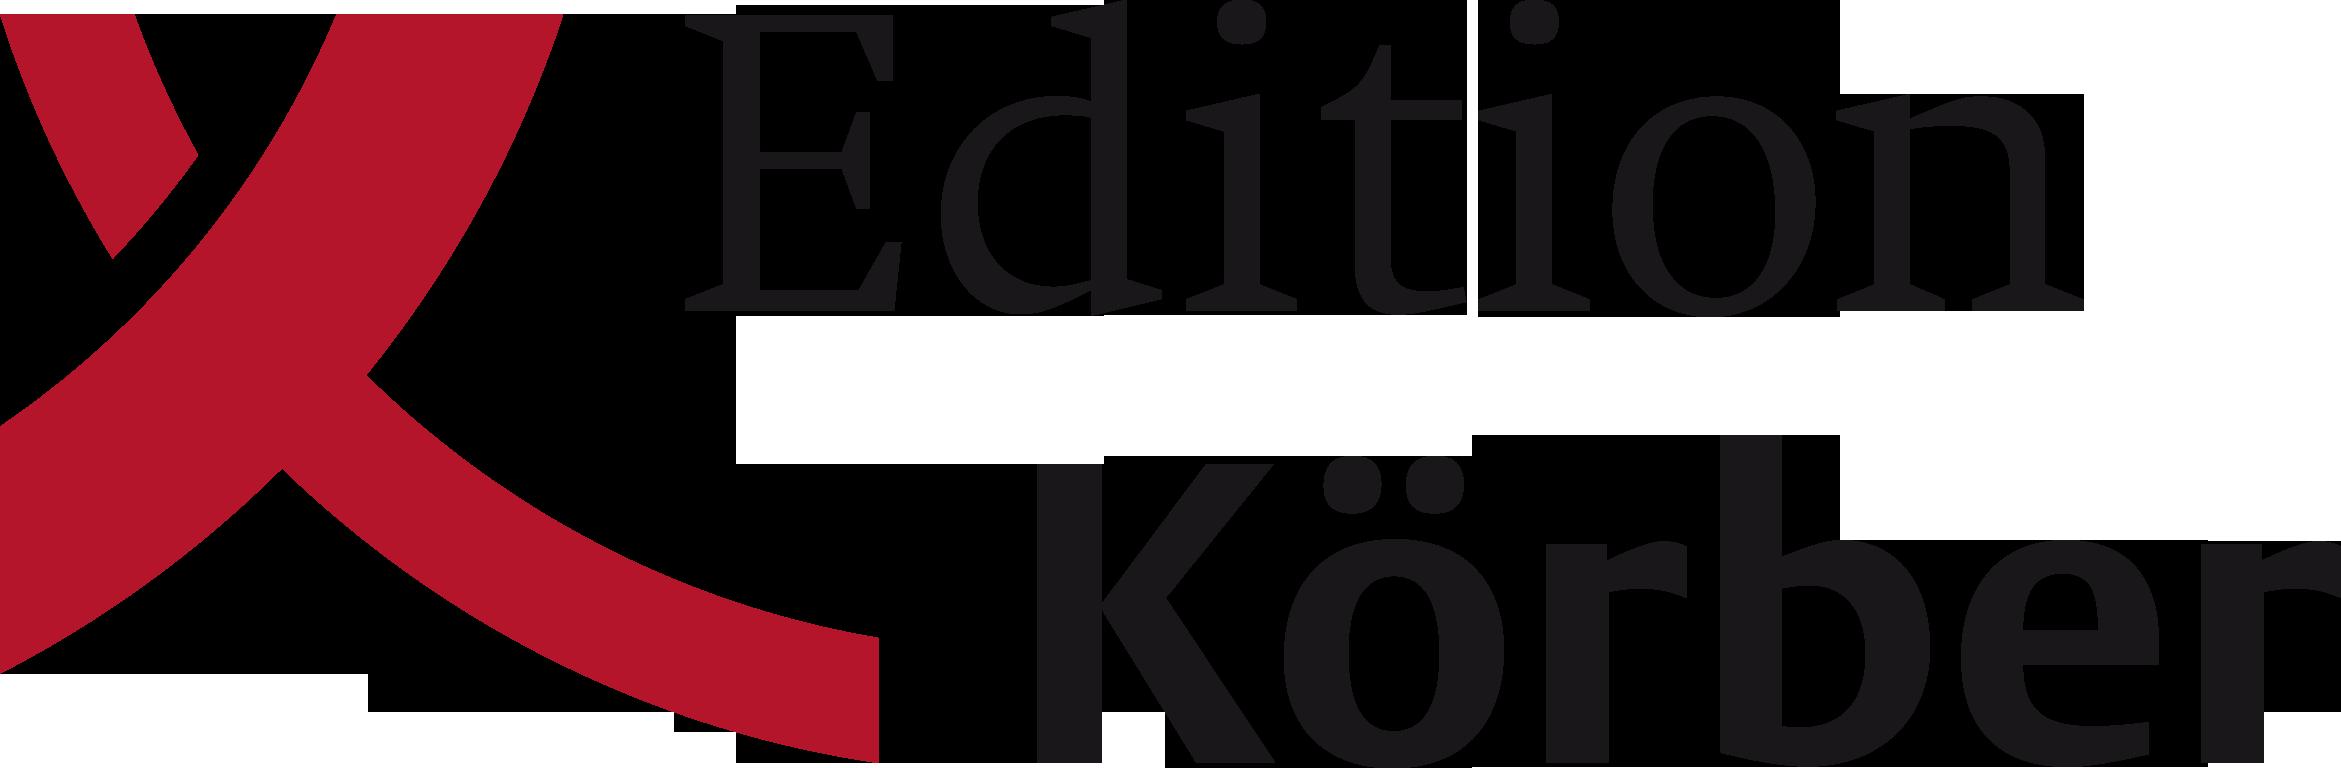 Edition Körber